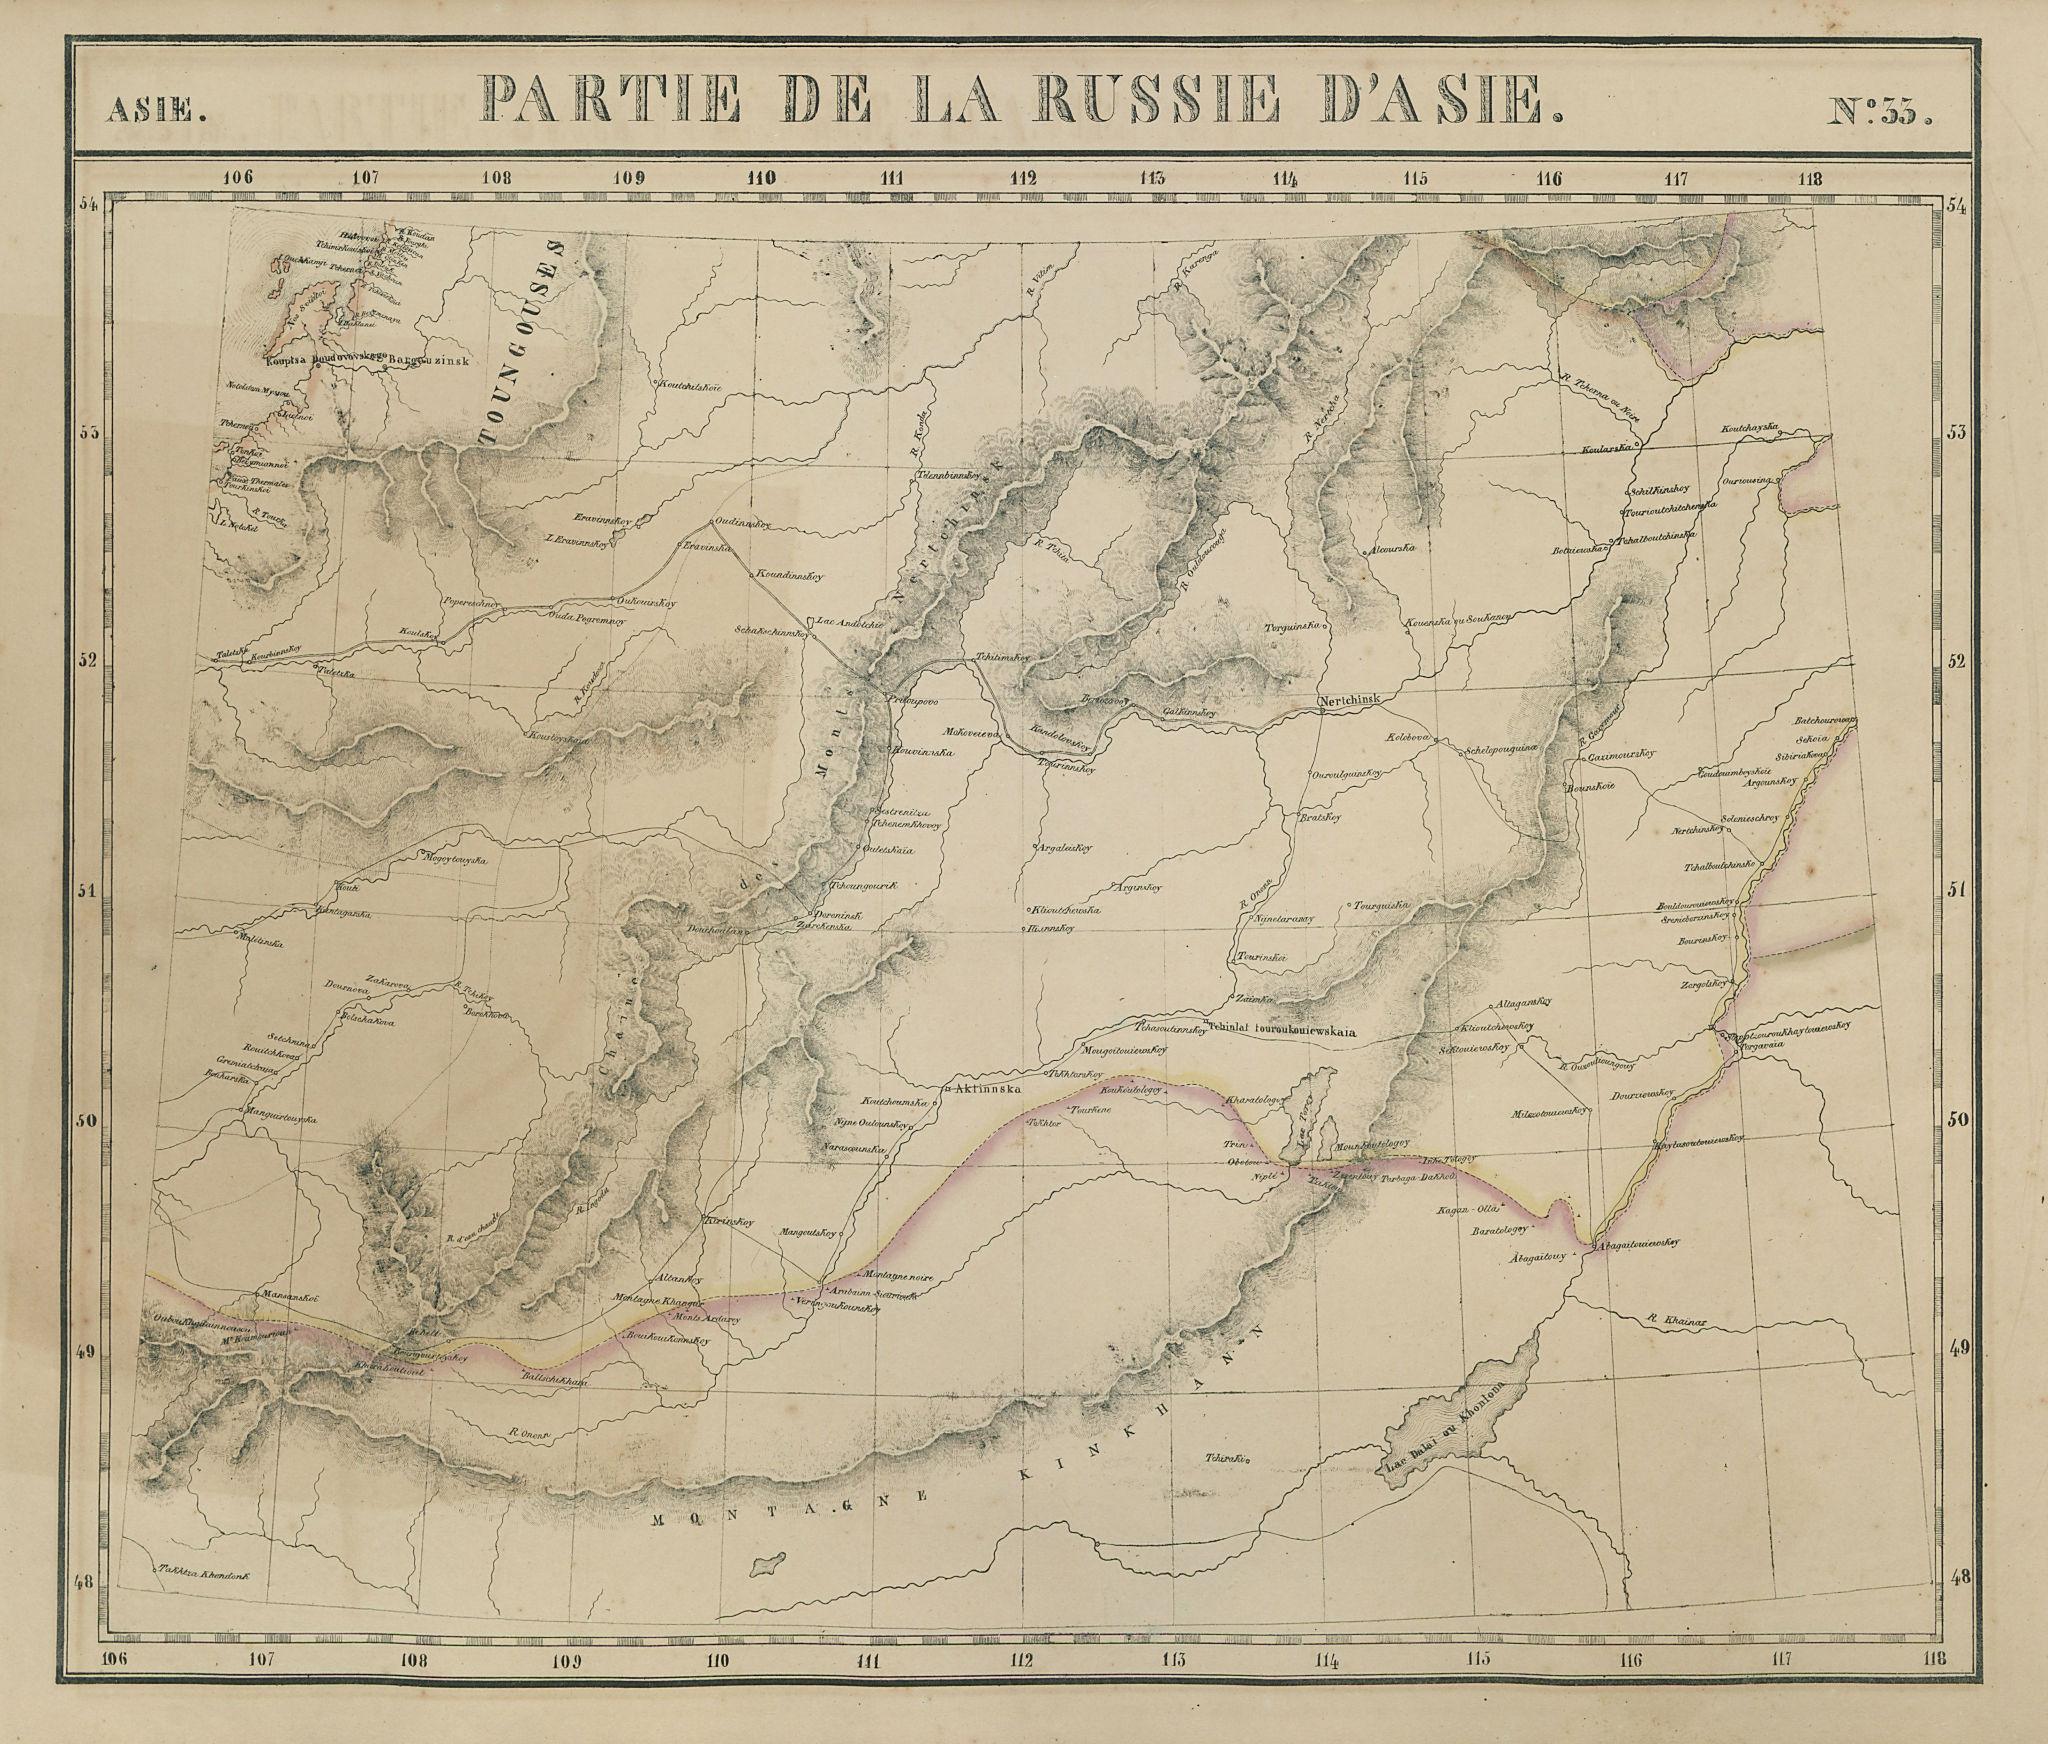 Russie d'Asie #33 Russia Mongolia. Buryatia Zabaykalsk. VANDERMAELEN 1827 map